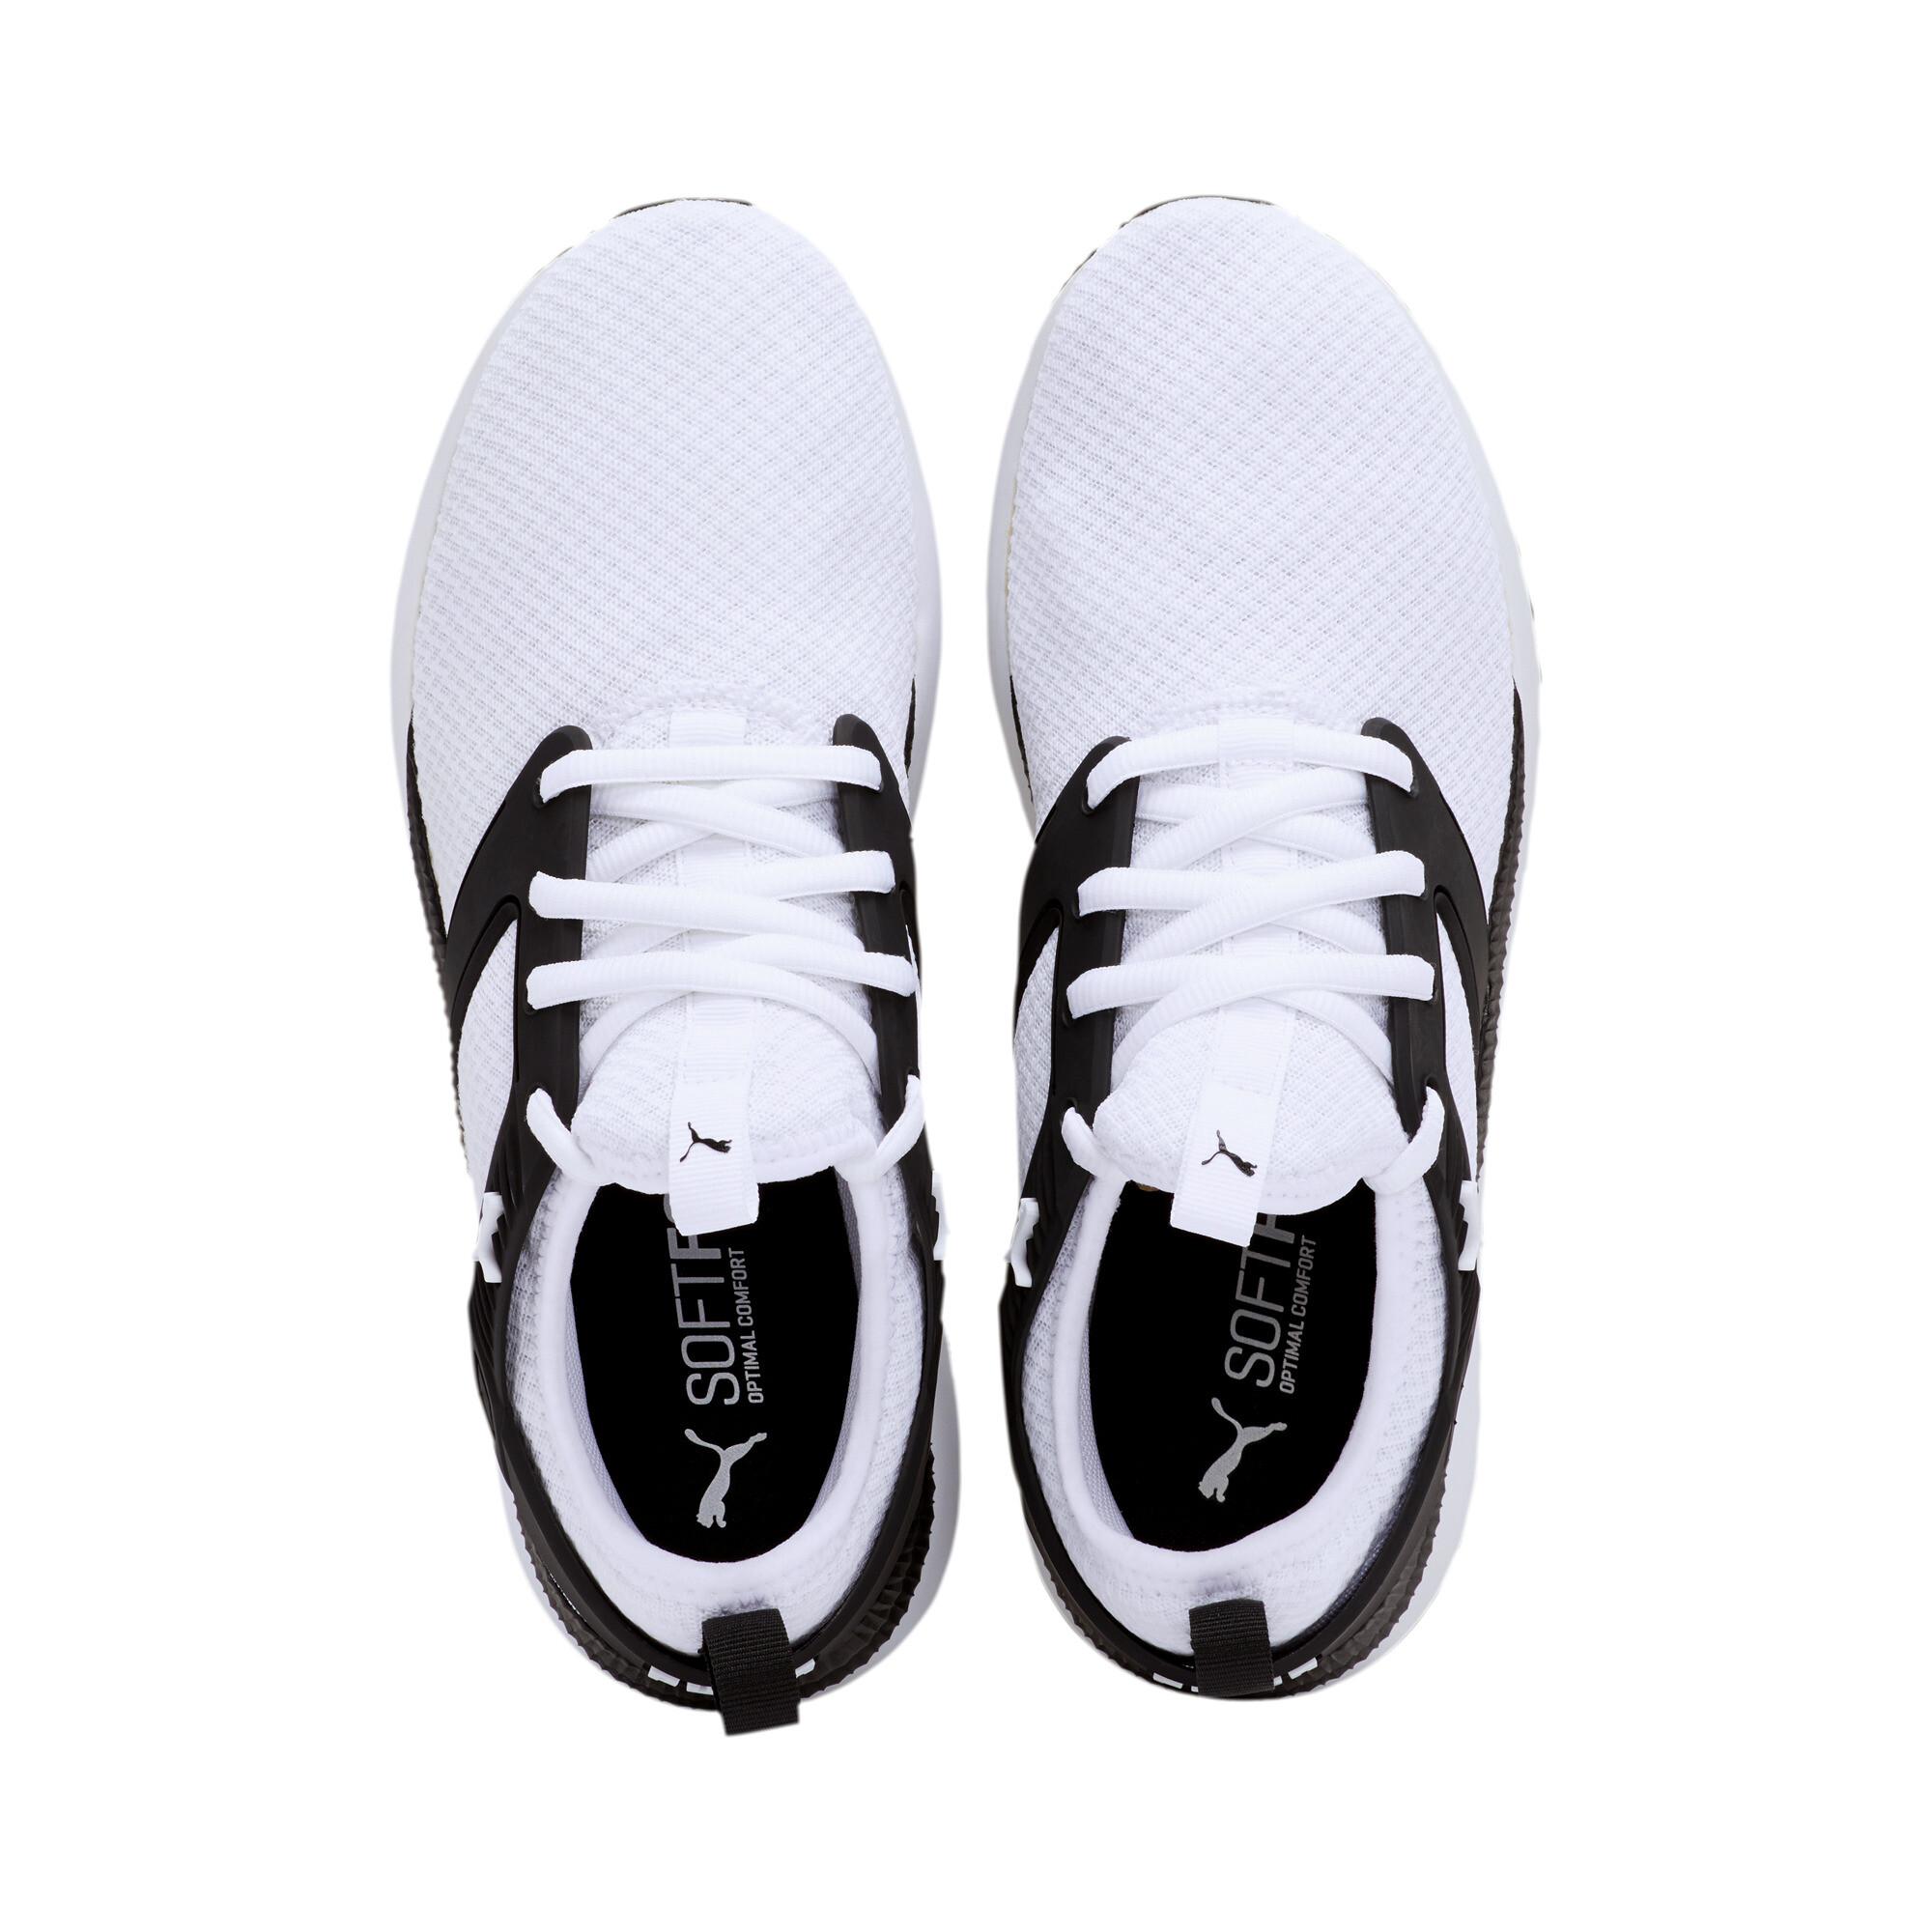 PUMA-Unisex-Pacer-Next-Excel-Mesh-Training-Shoes thumbnail 13